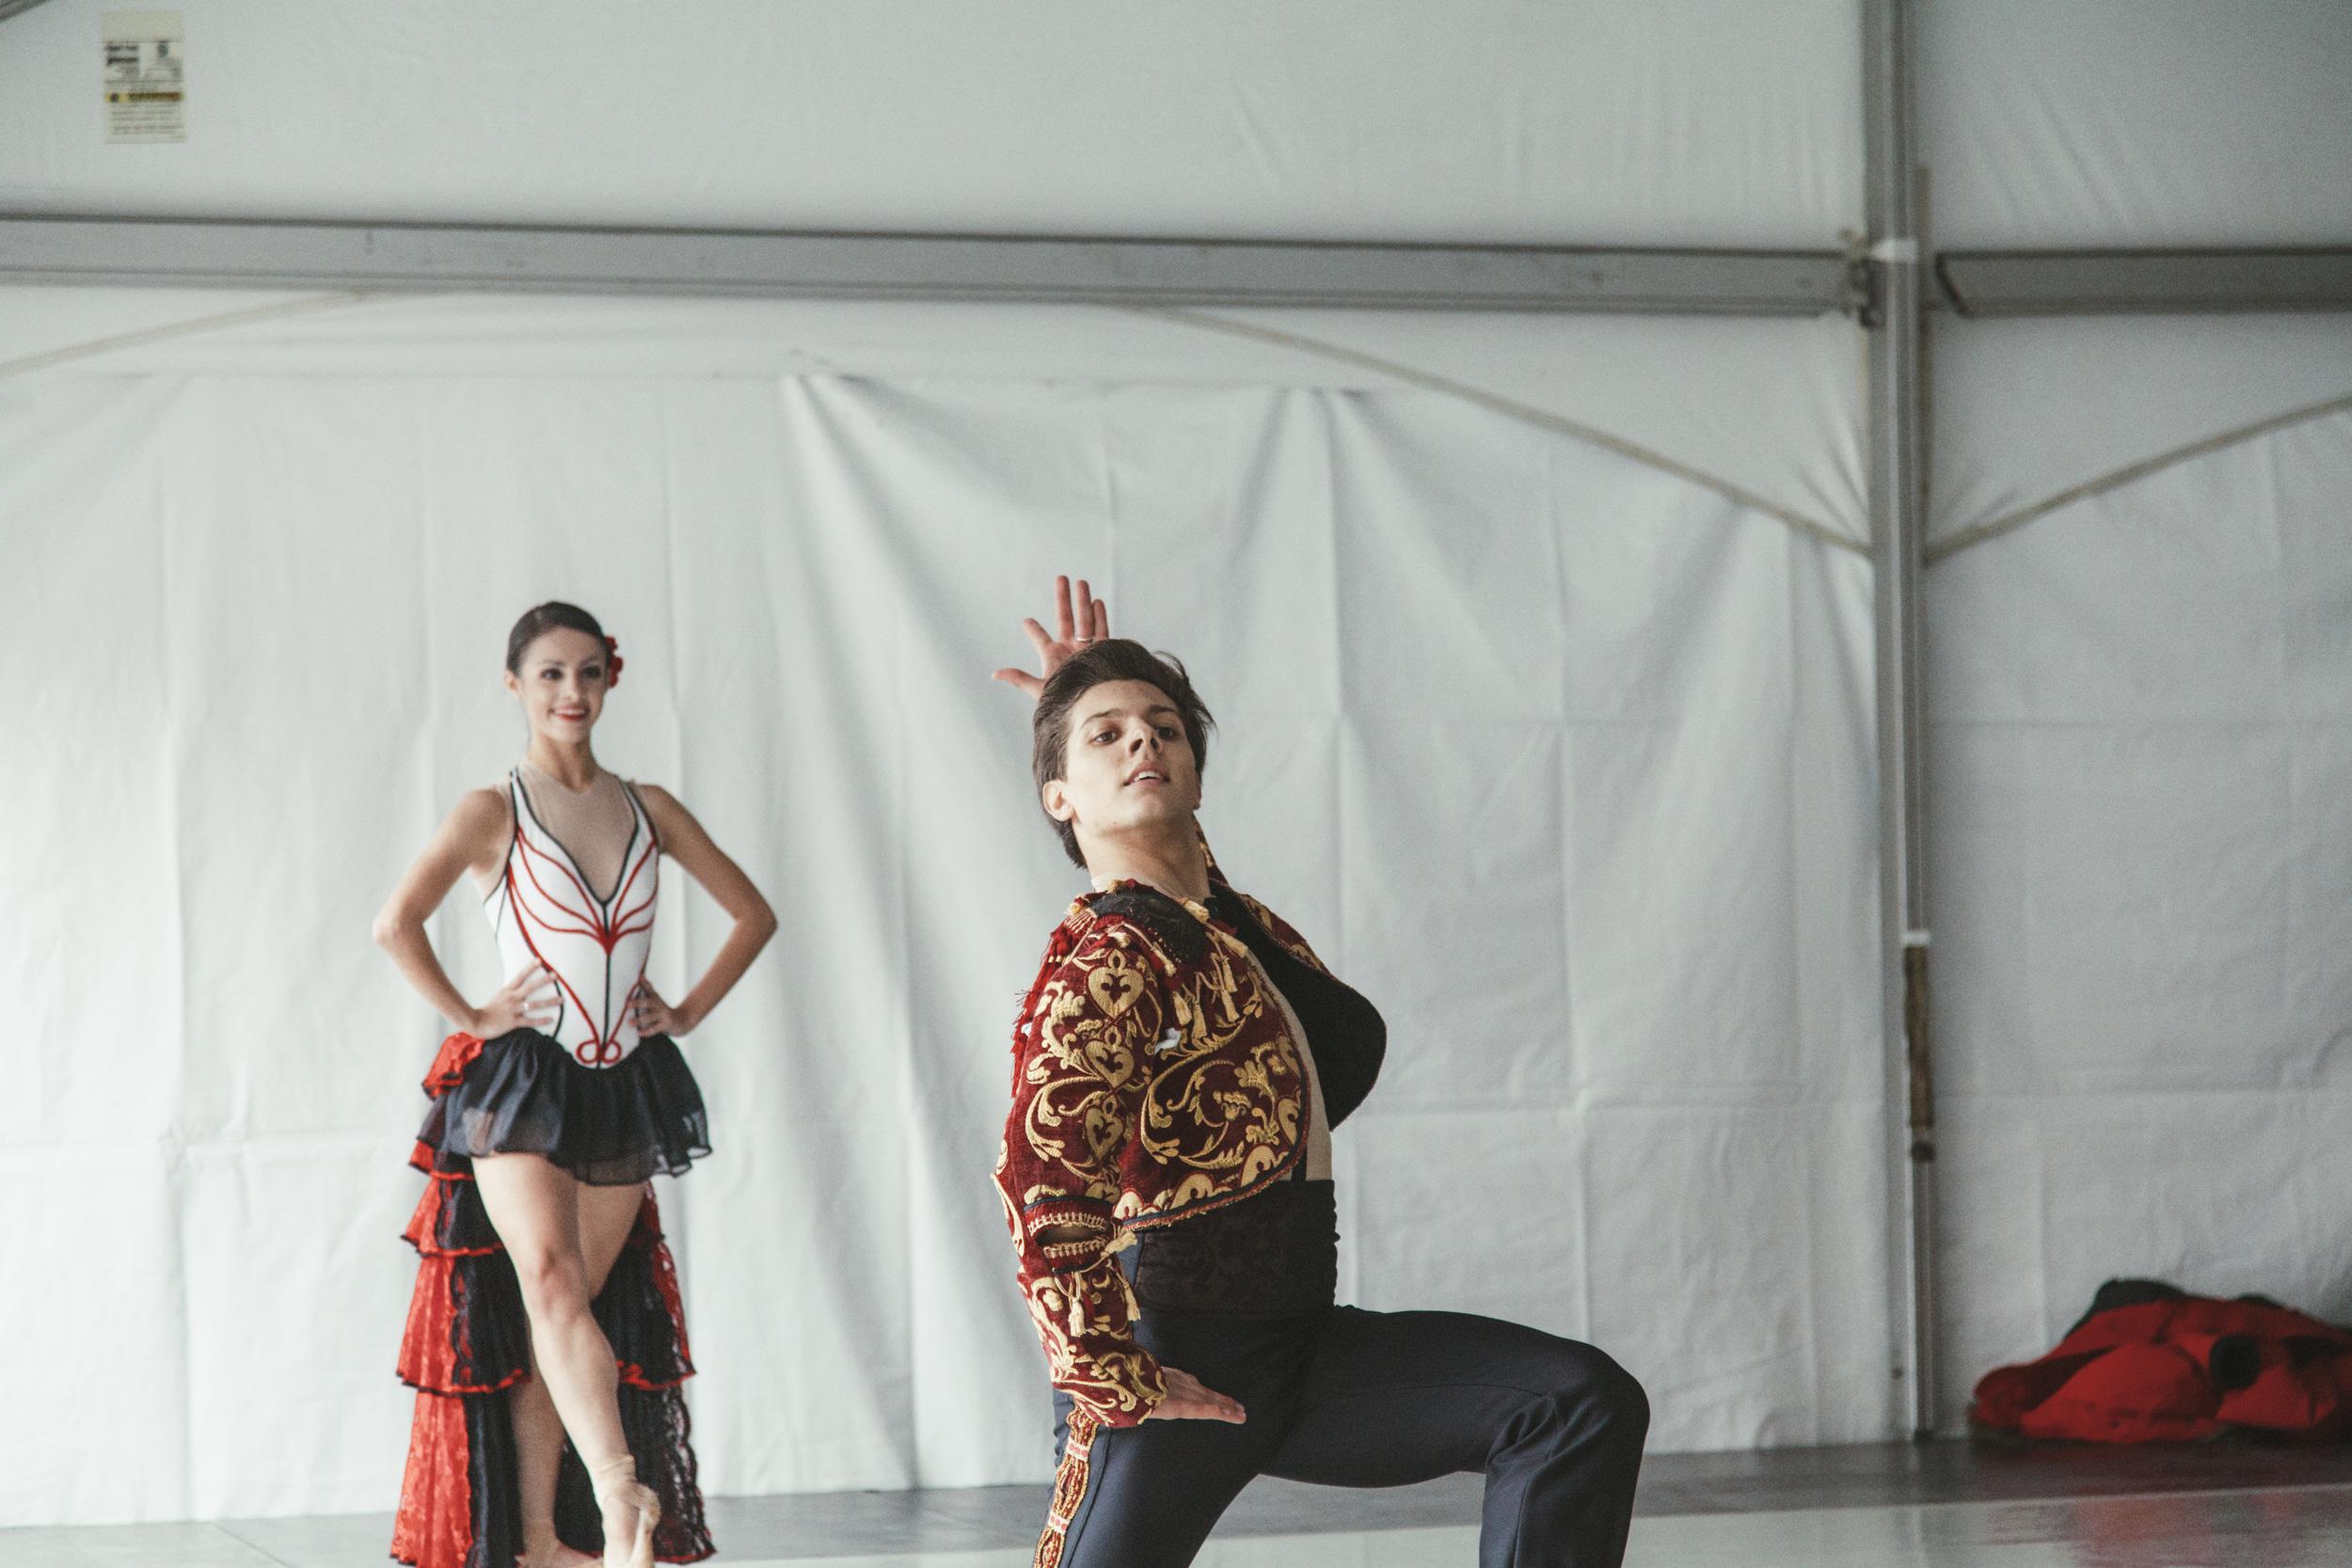 Bozzuto Fall Festival - Performances-26.JPG